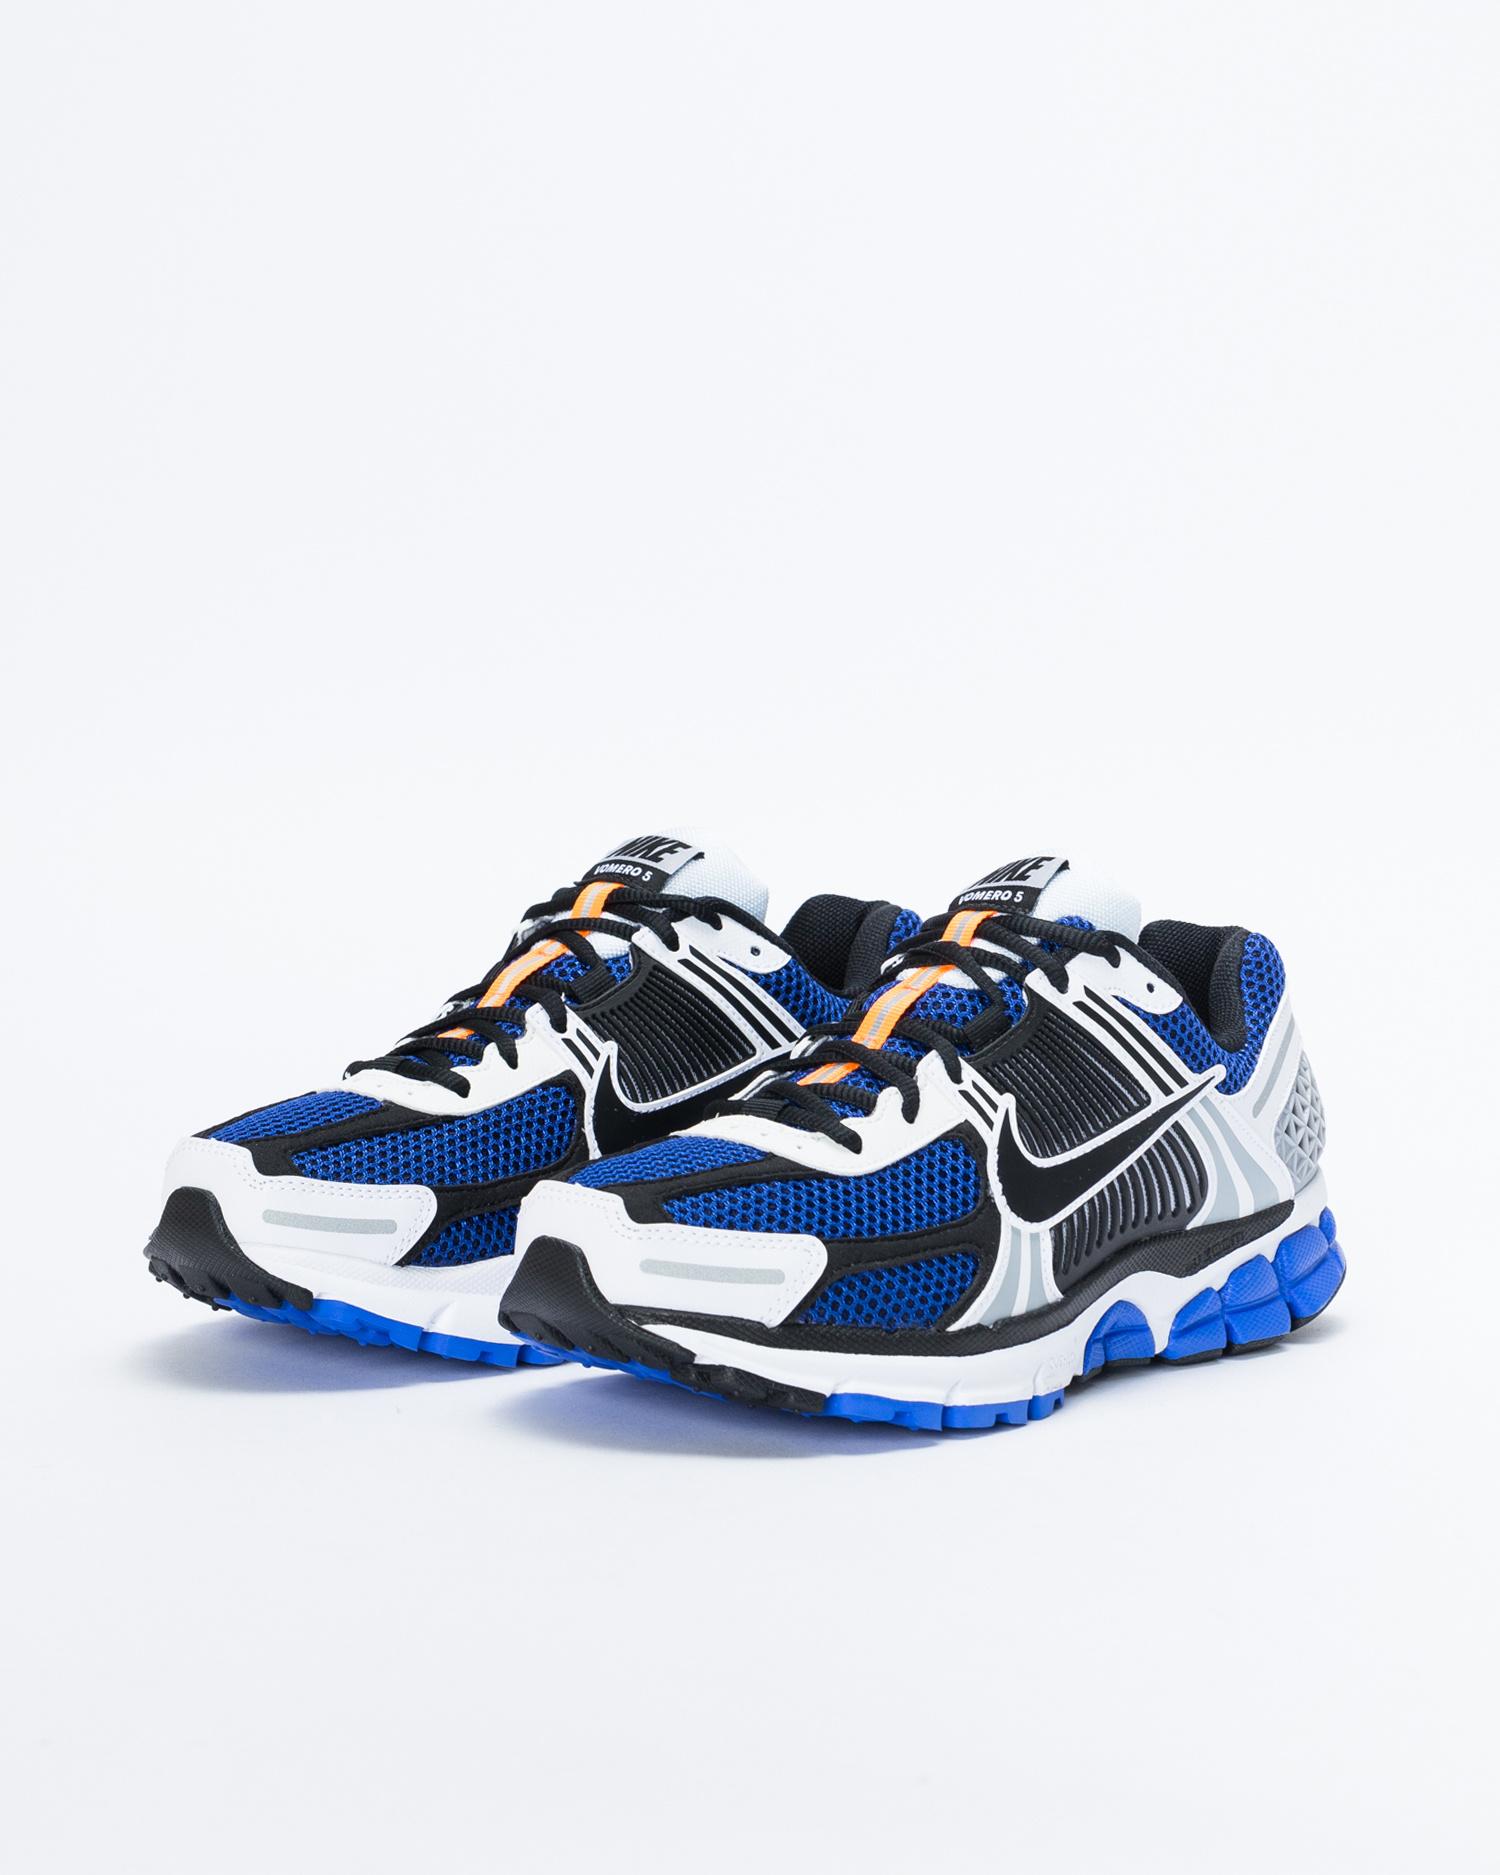 hot sale online 02535 7c87e Nike Zoom Vomero 5 Se SP White Racer Blue-Black-Sail ...